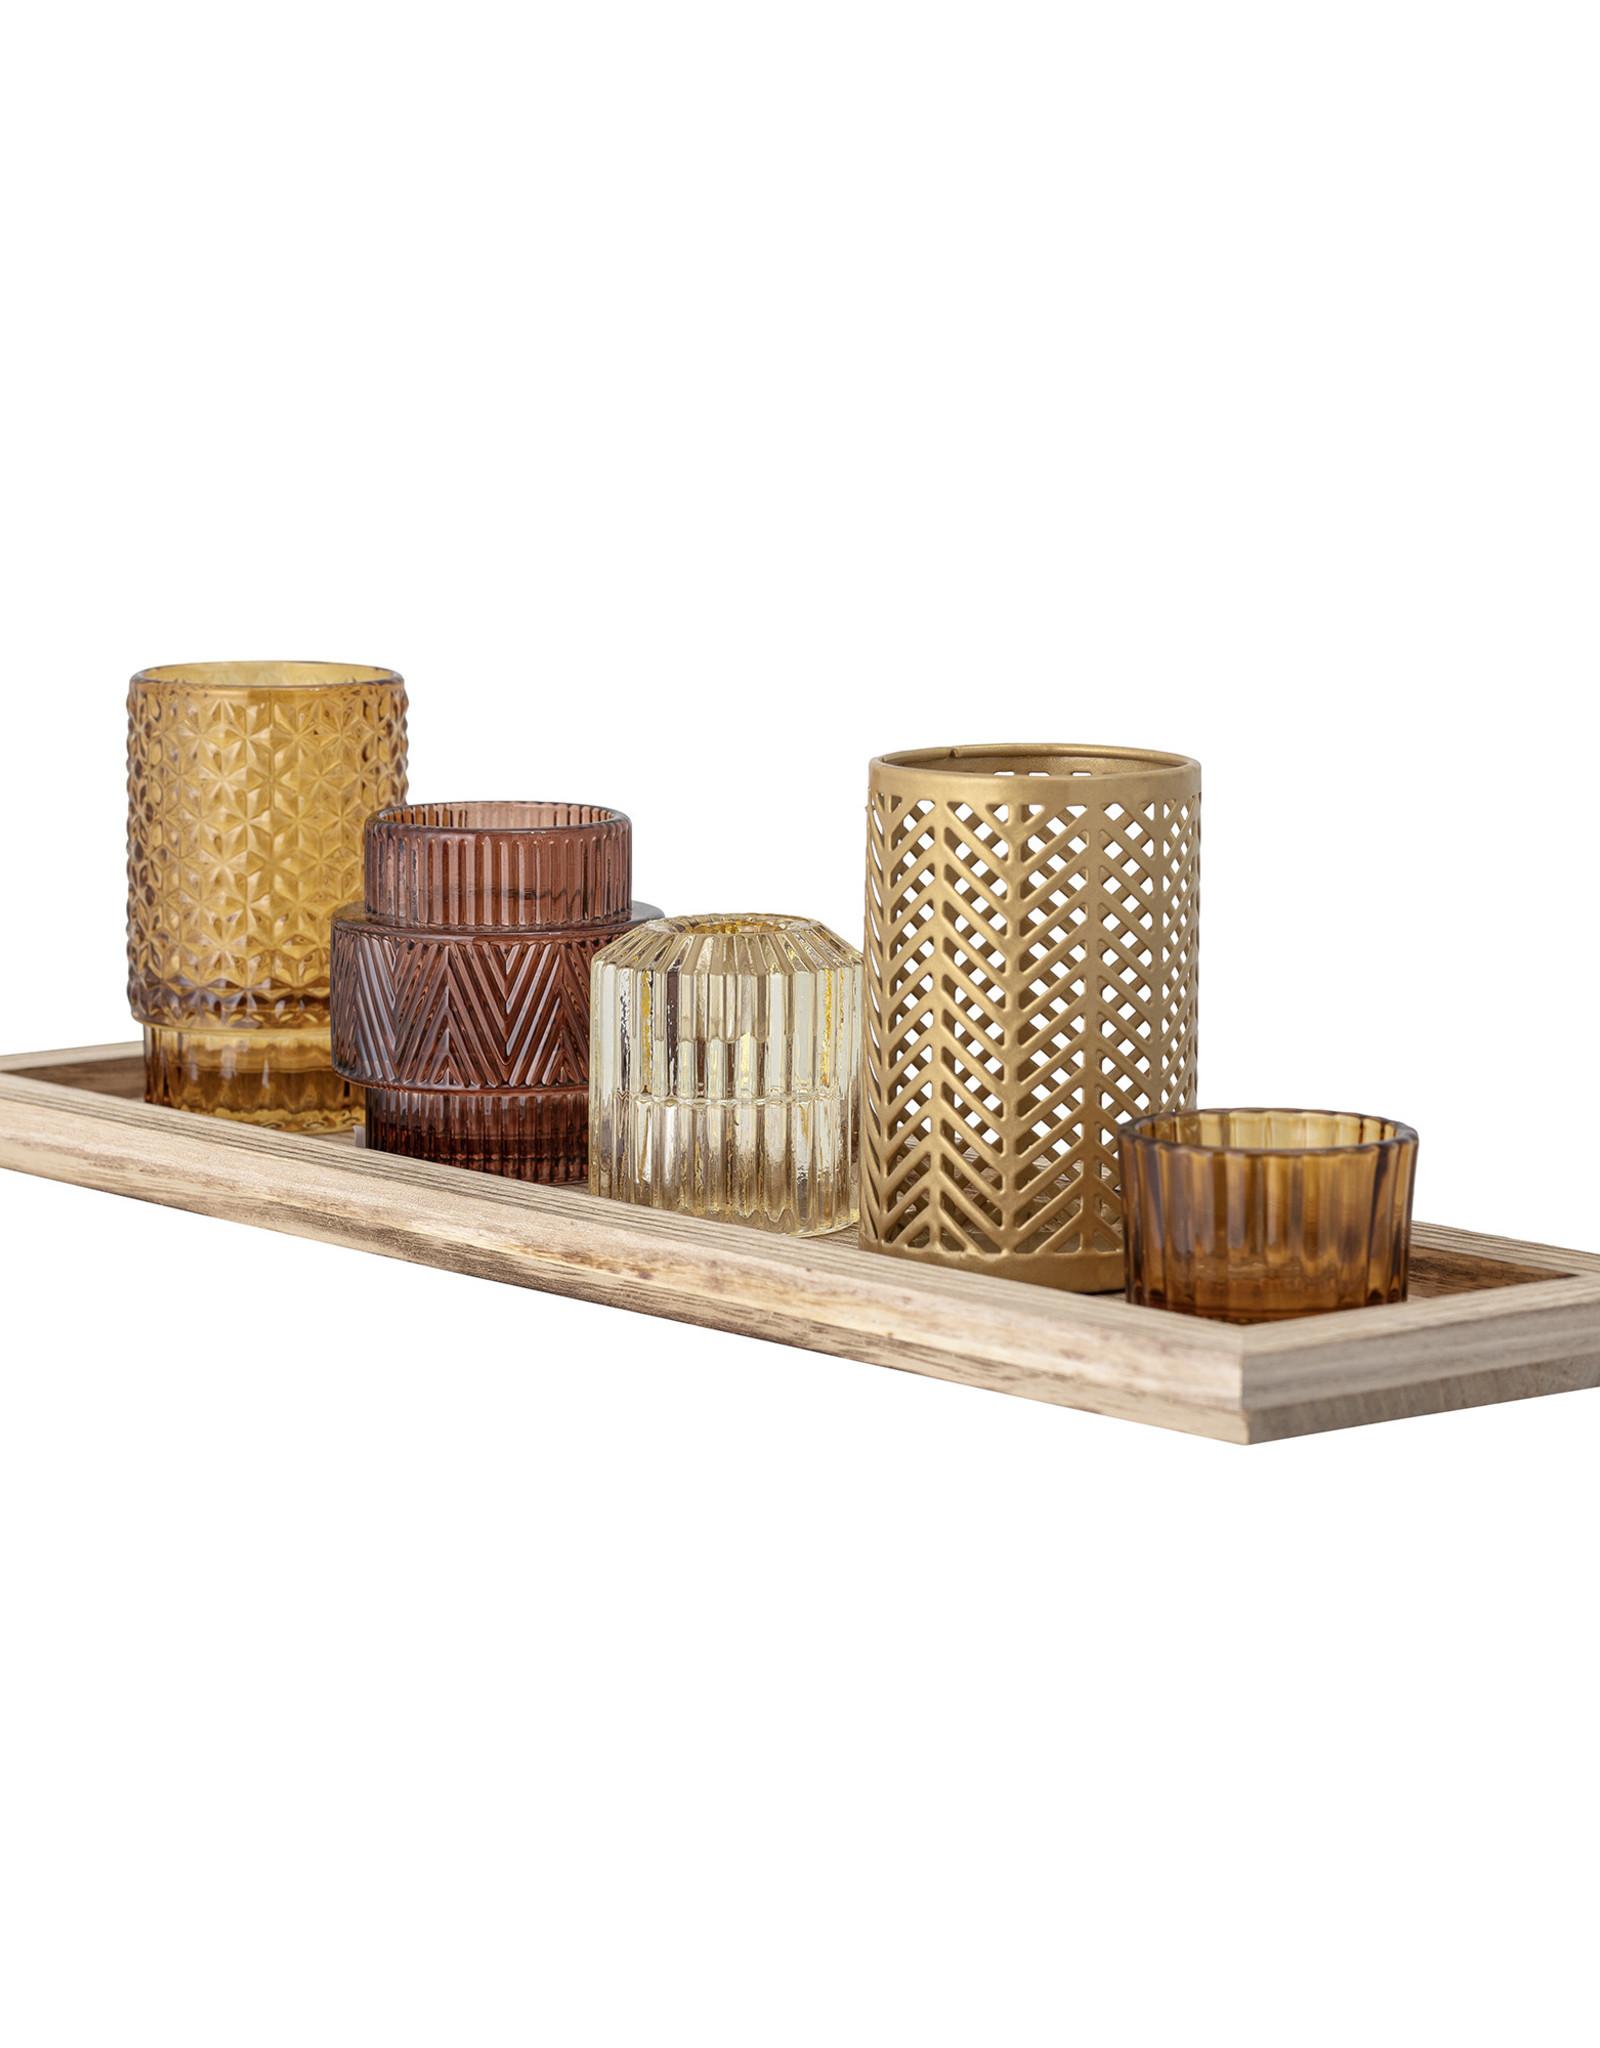 Bloomingville Bloomingville - Waxinelichtjes - Glas/Hout - Bruin - set van 6 - L43xH10,5xB12,5 cm